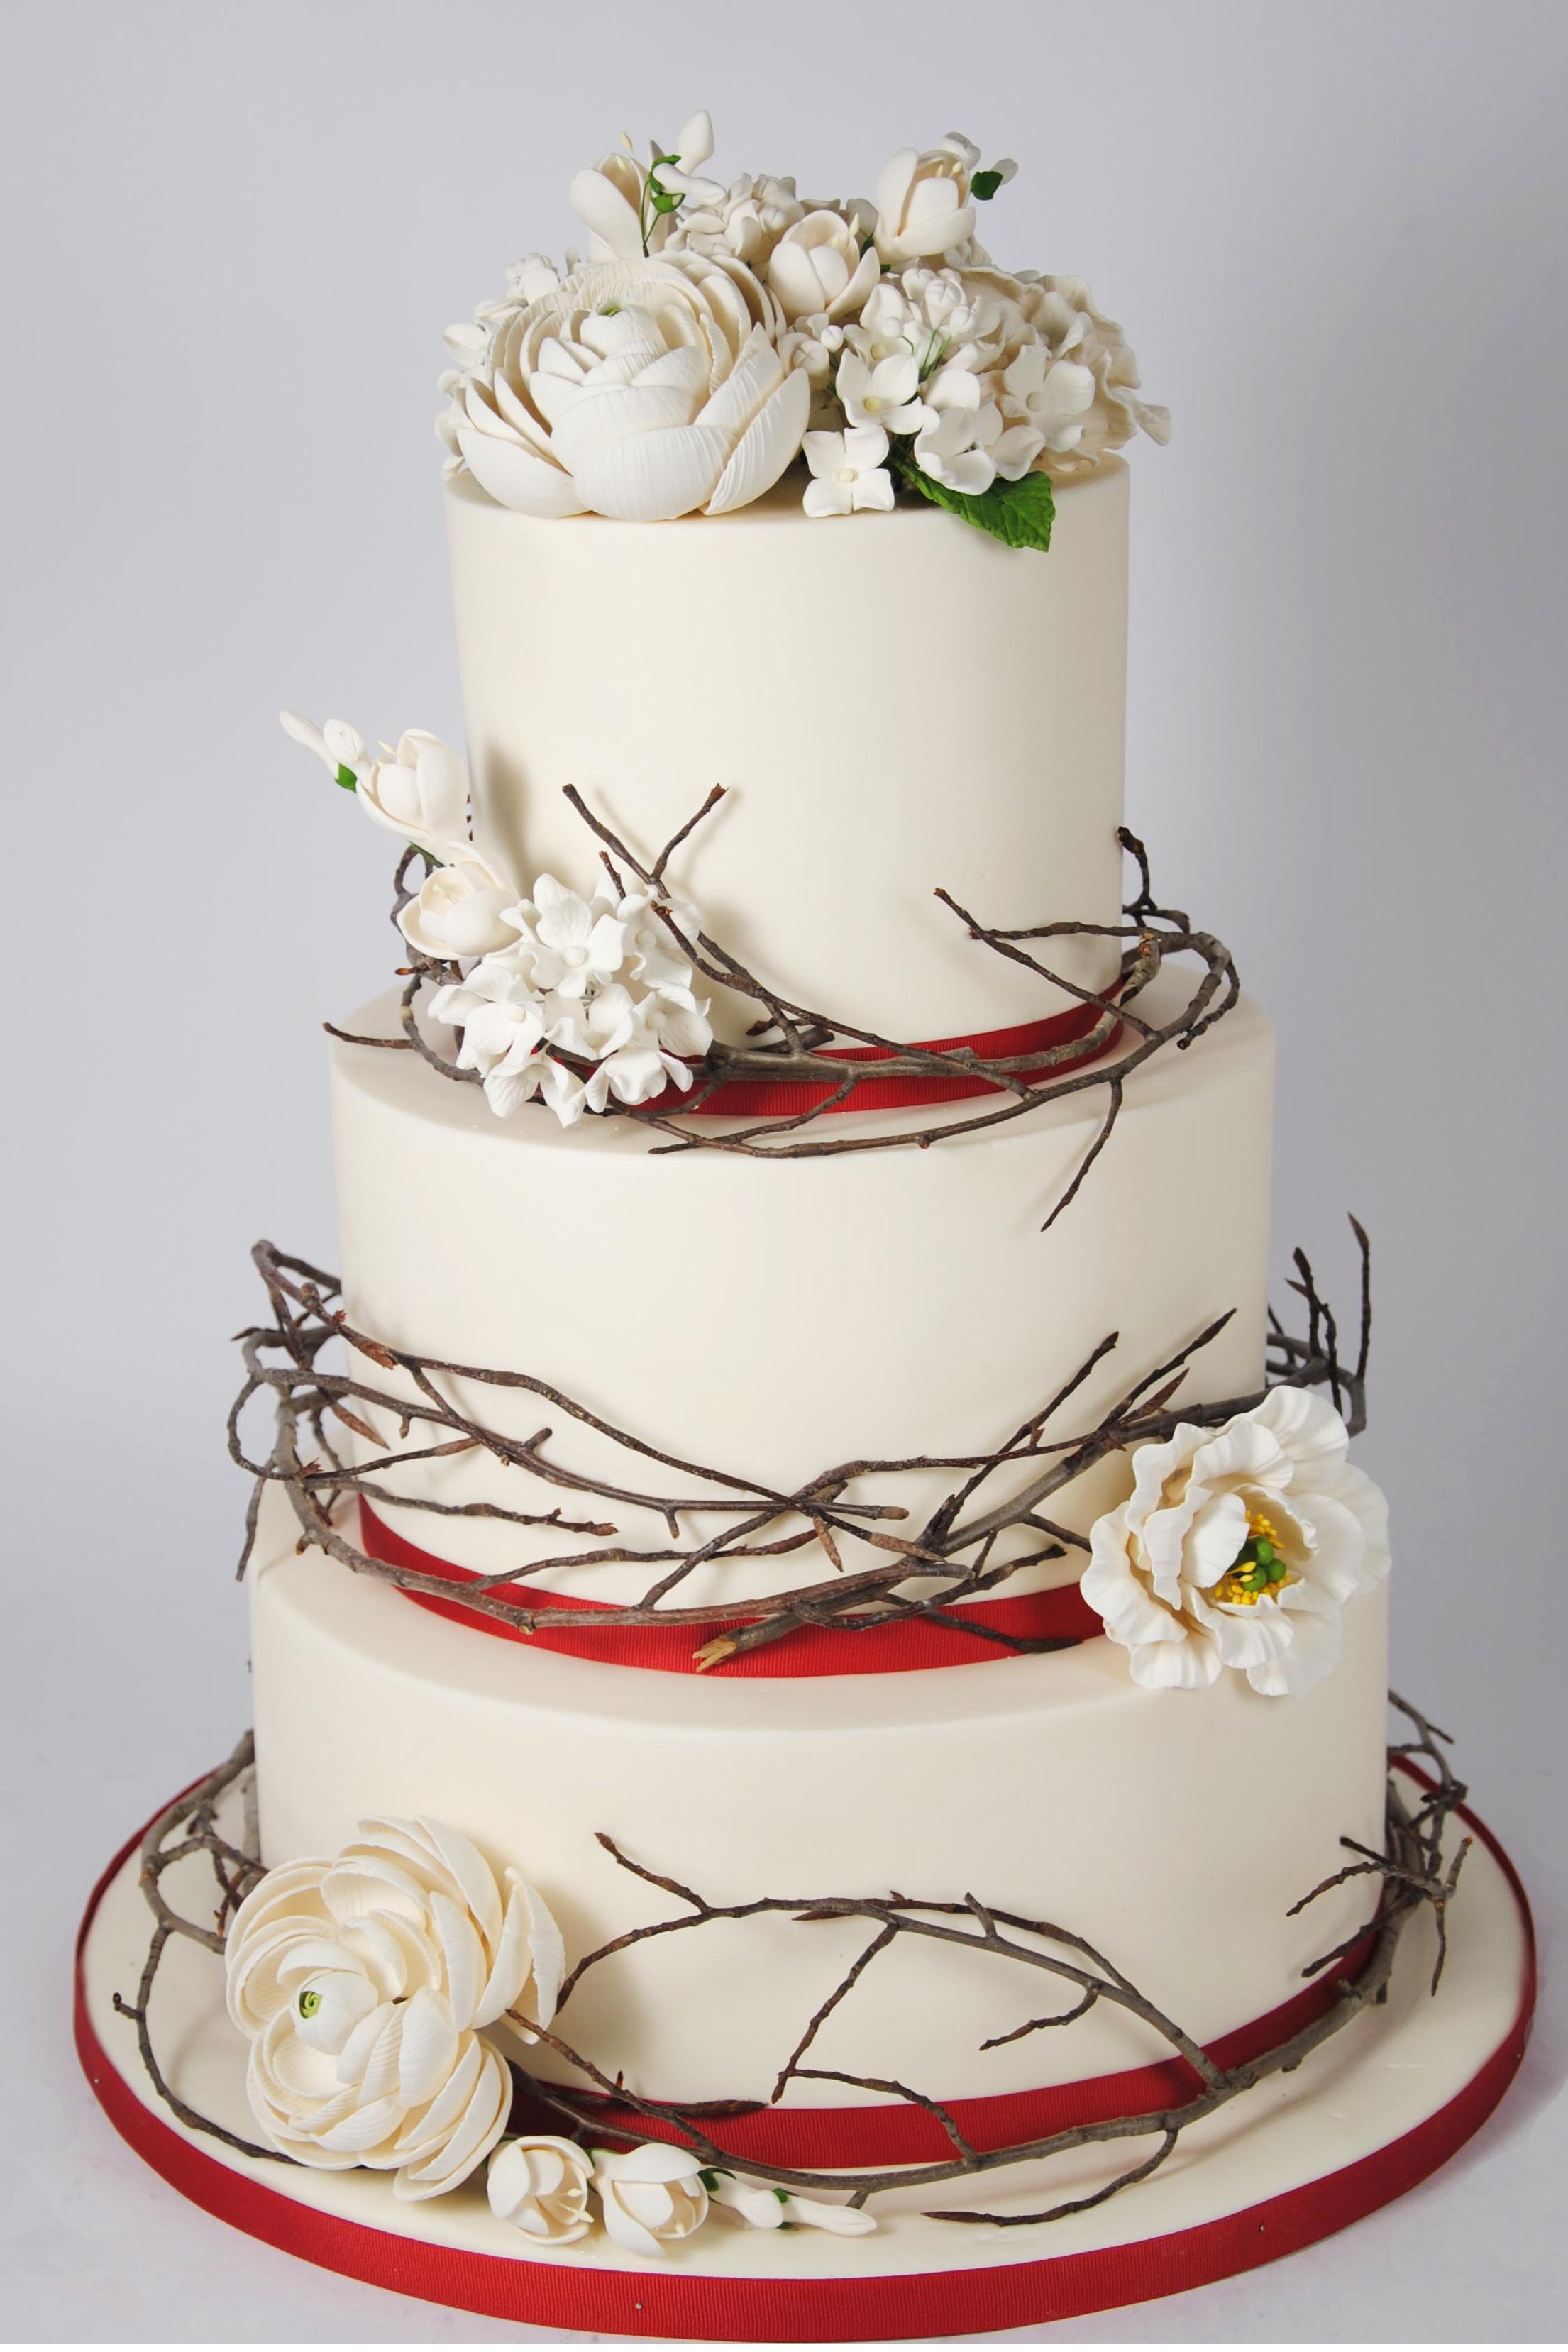 Custom Wedding Cakes – For the Love of Cake